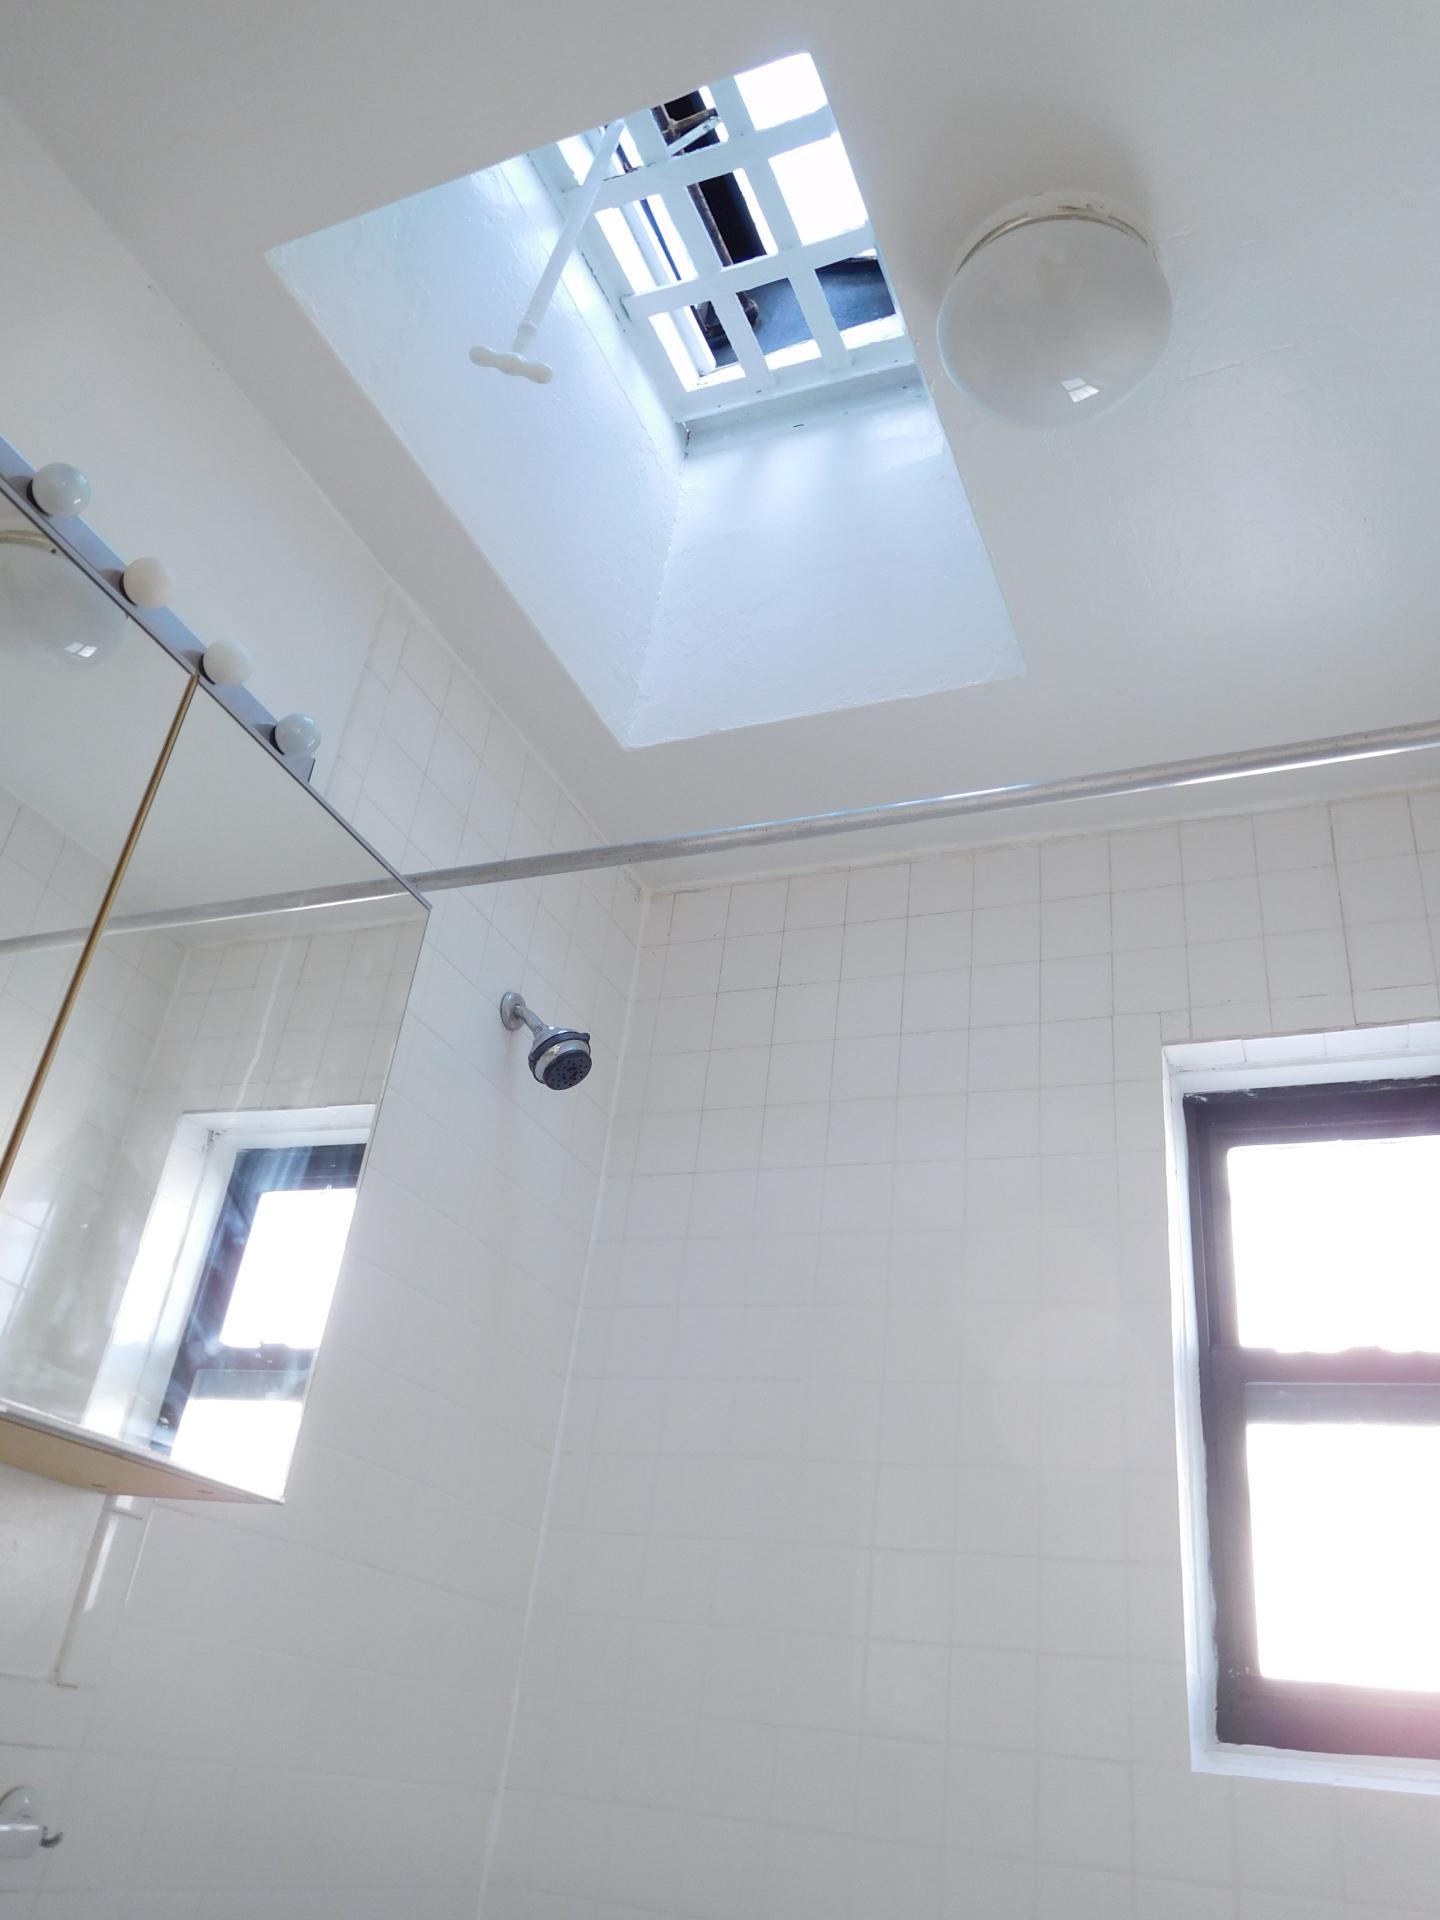 Bathroom with Rooflight Window